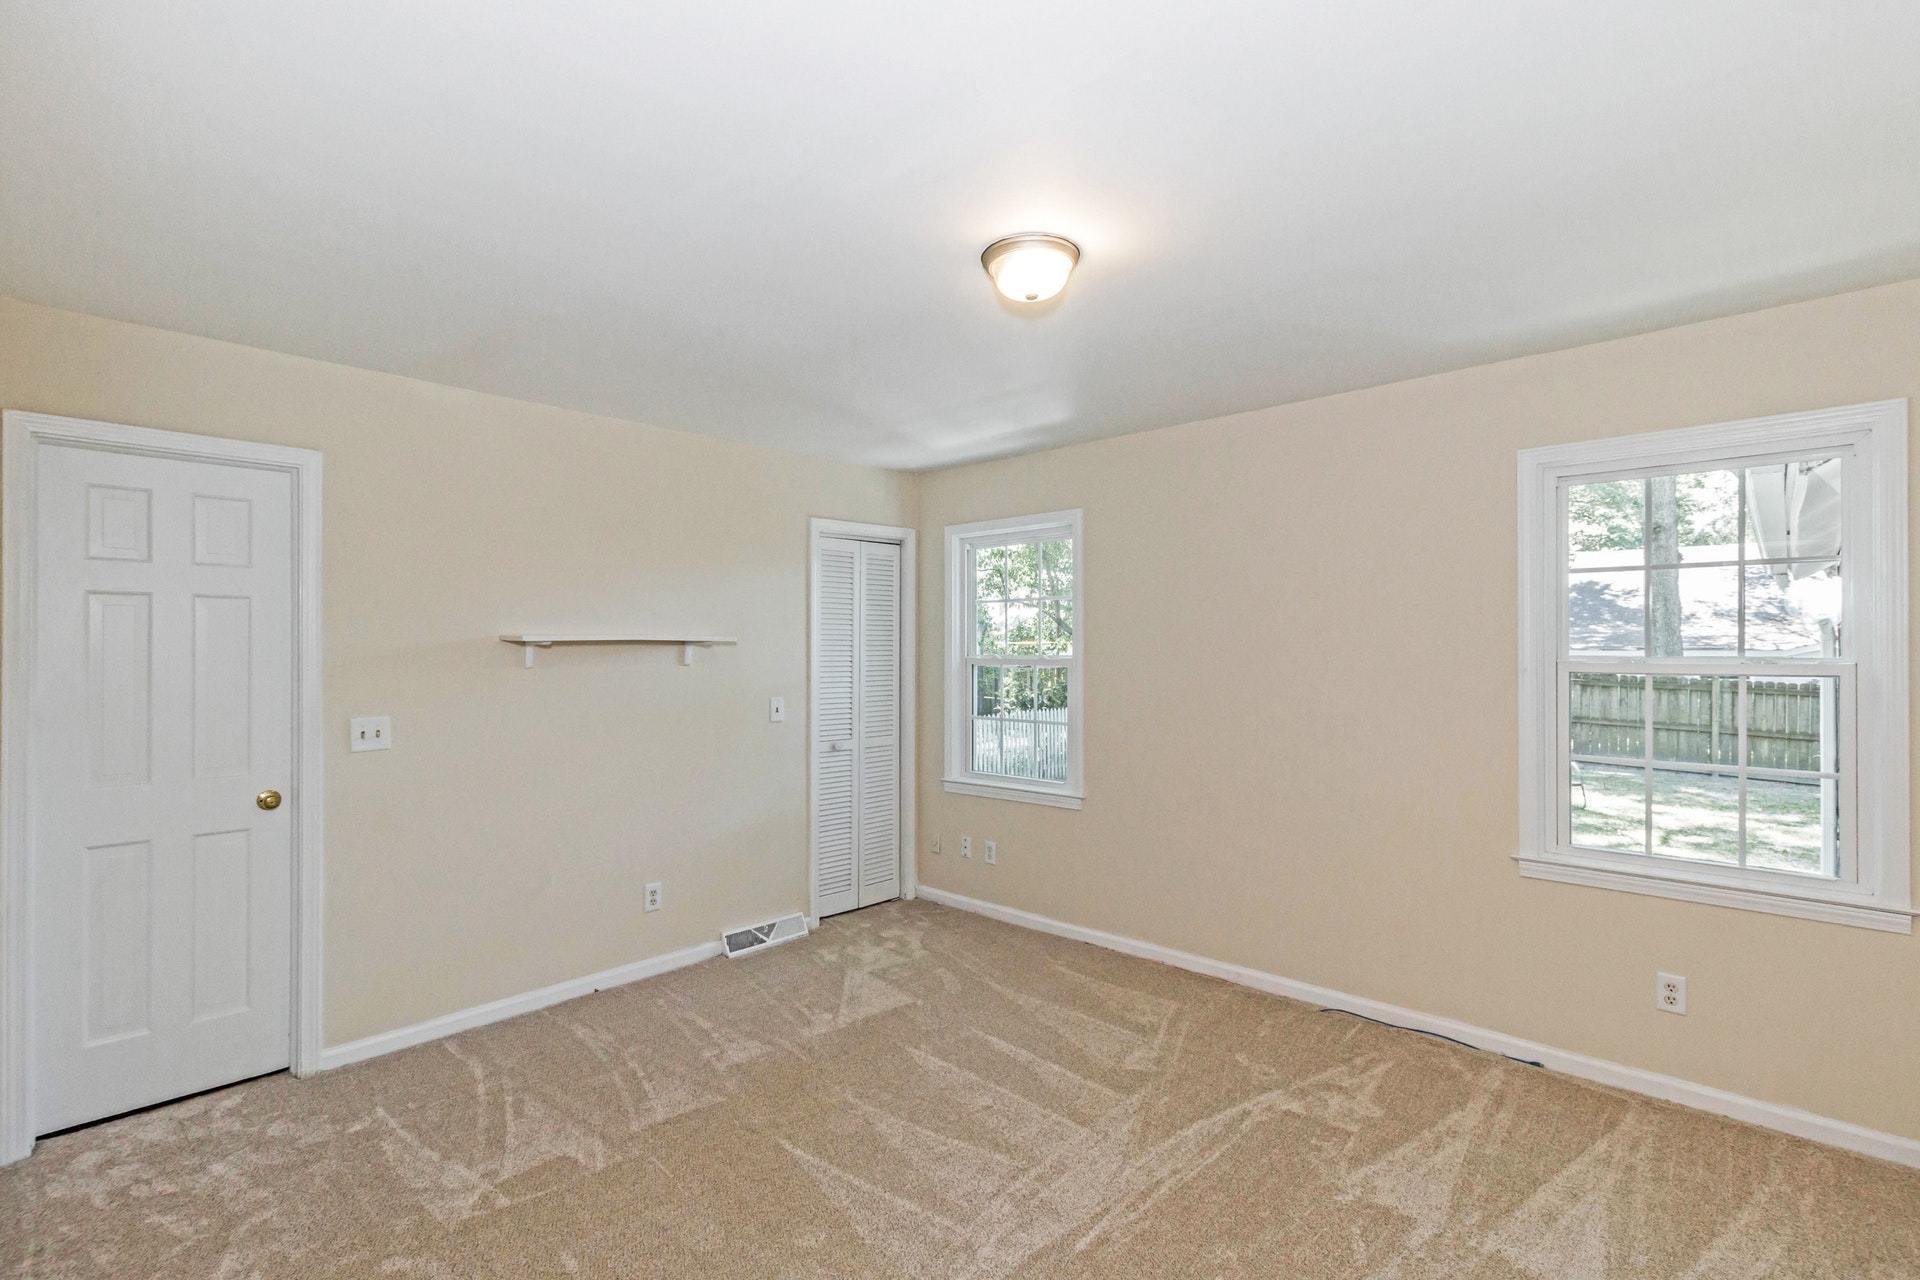 Shemwood II Homes For Sale - 969 Sea Gull, Mount Pleasant, SC - 15